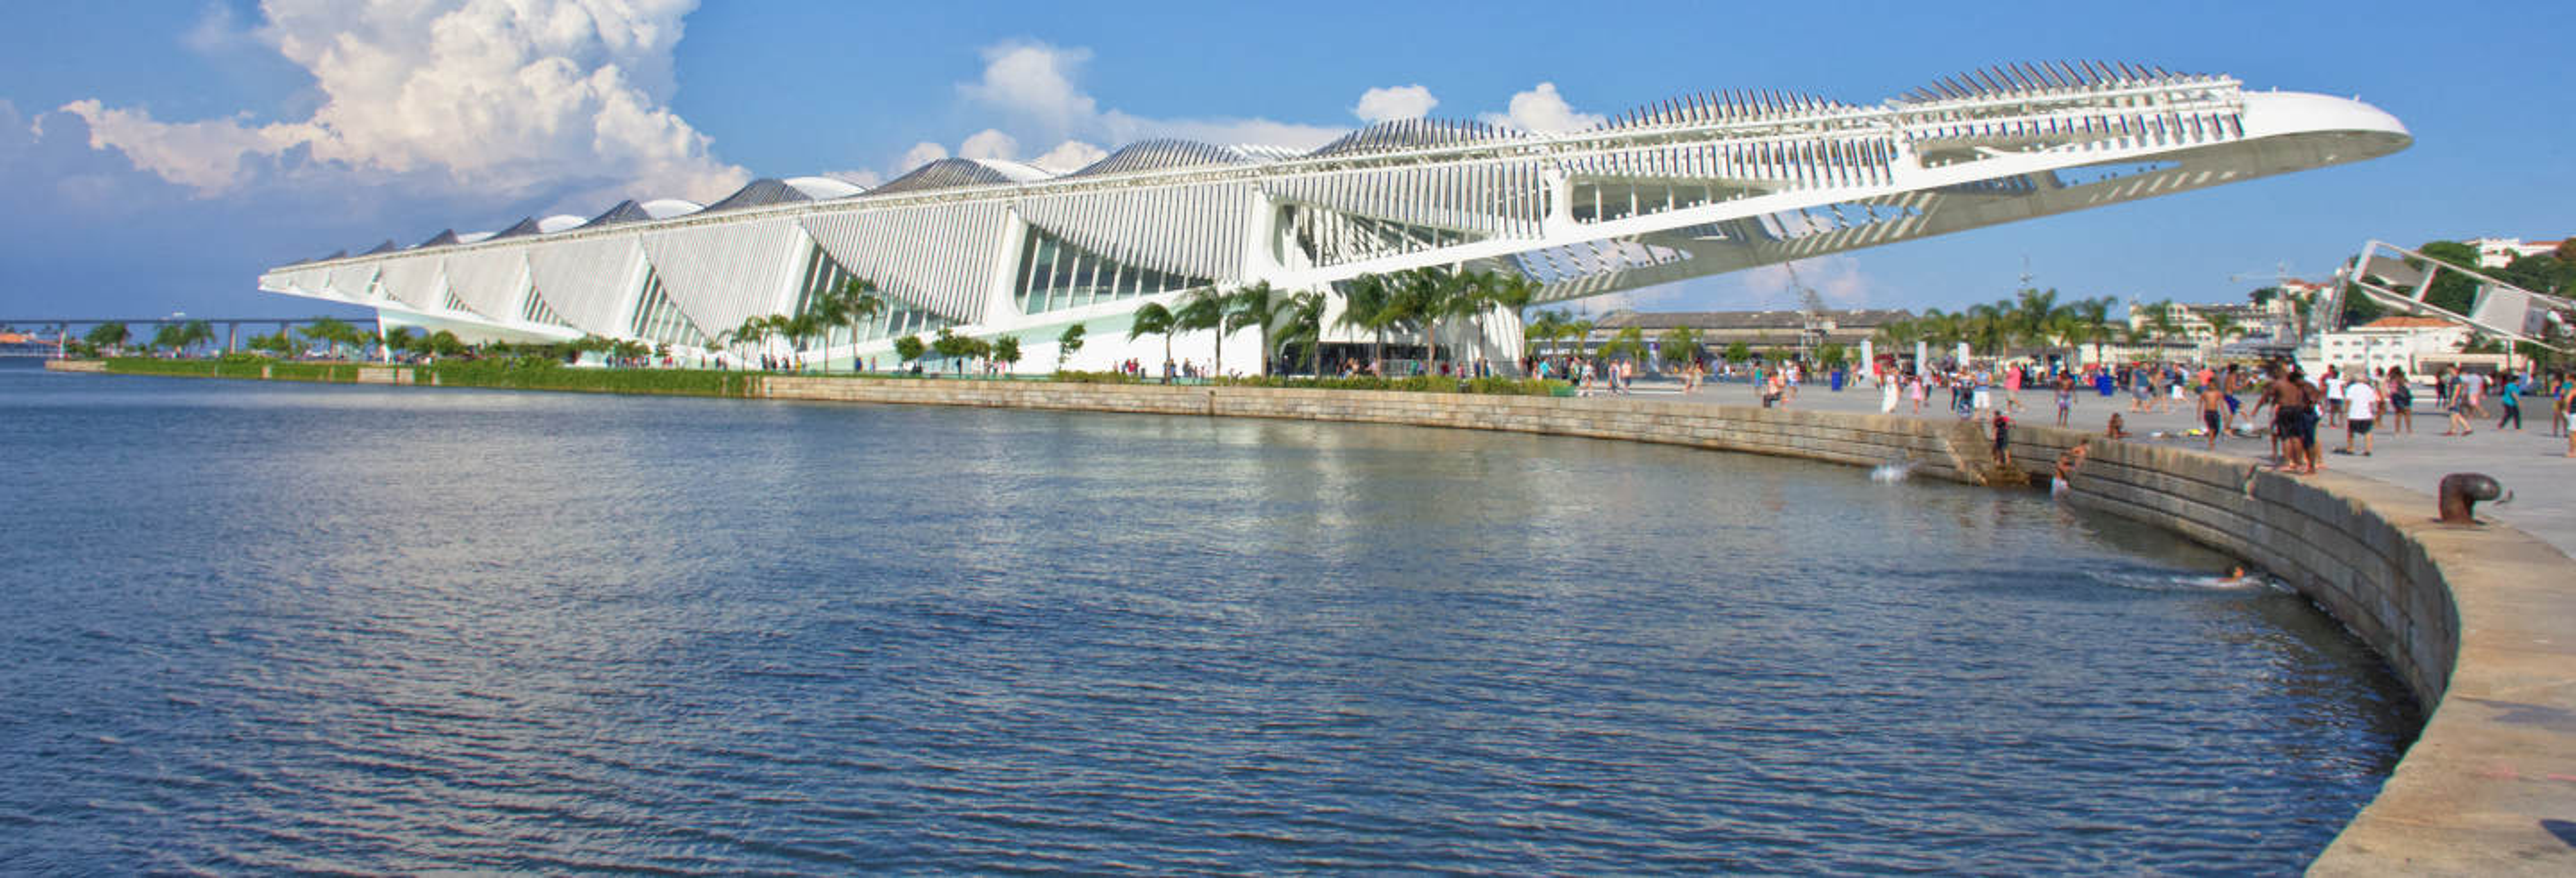 Olympic Boulevard + Museum of Tomorrow Tour